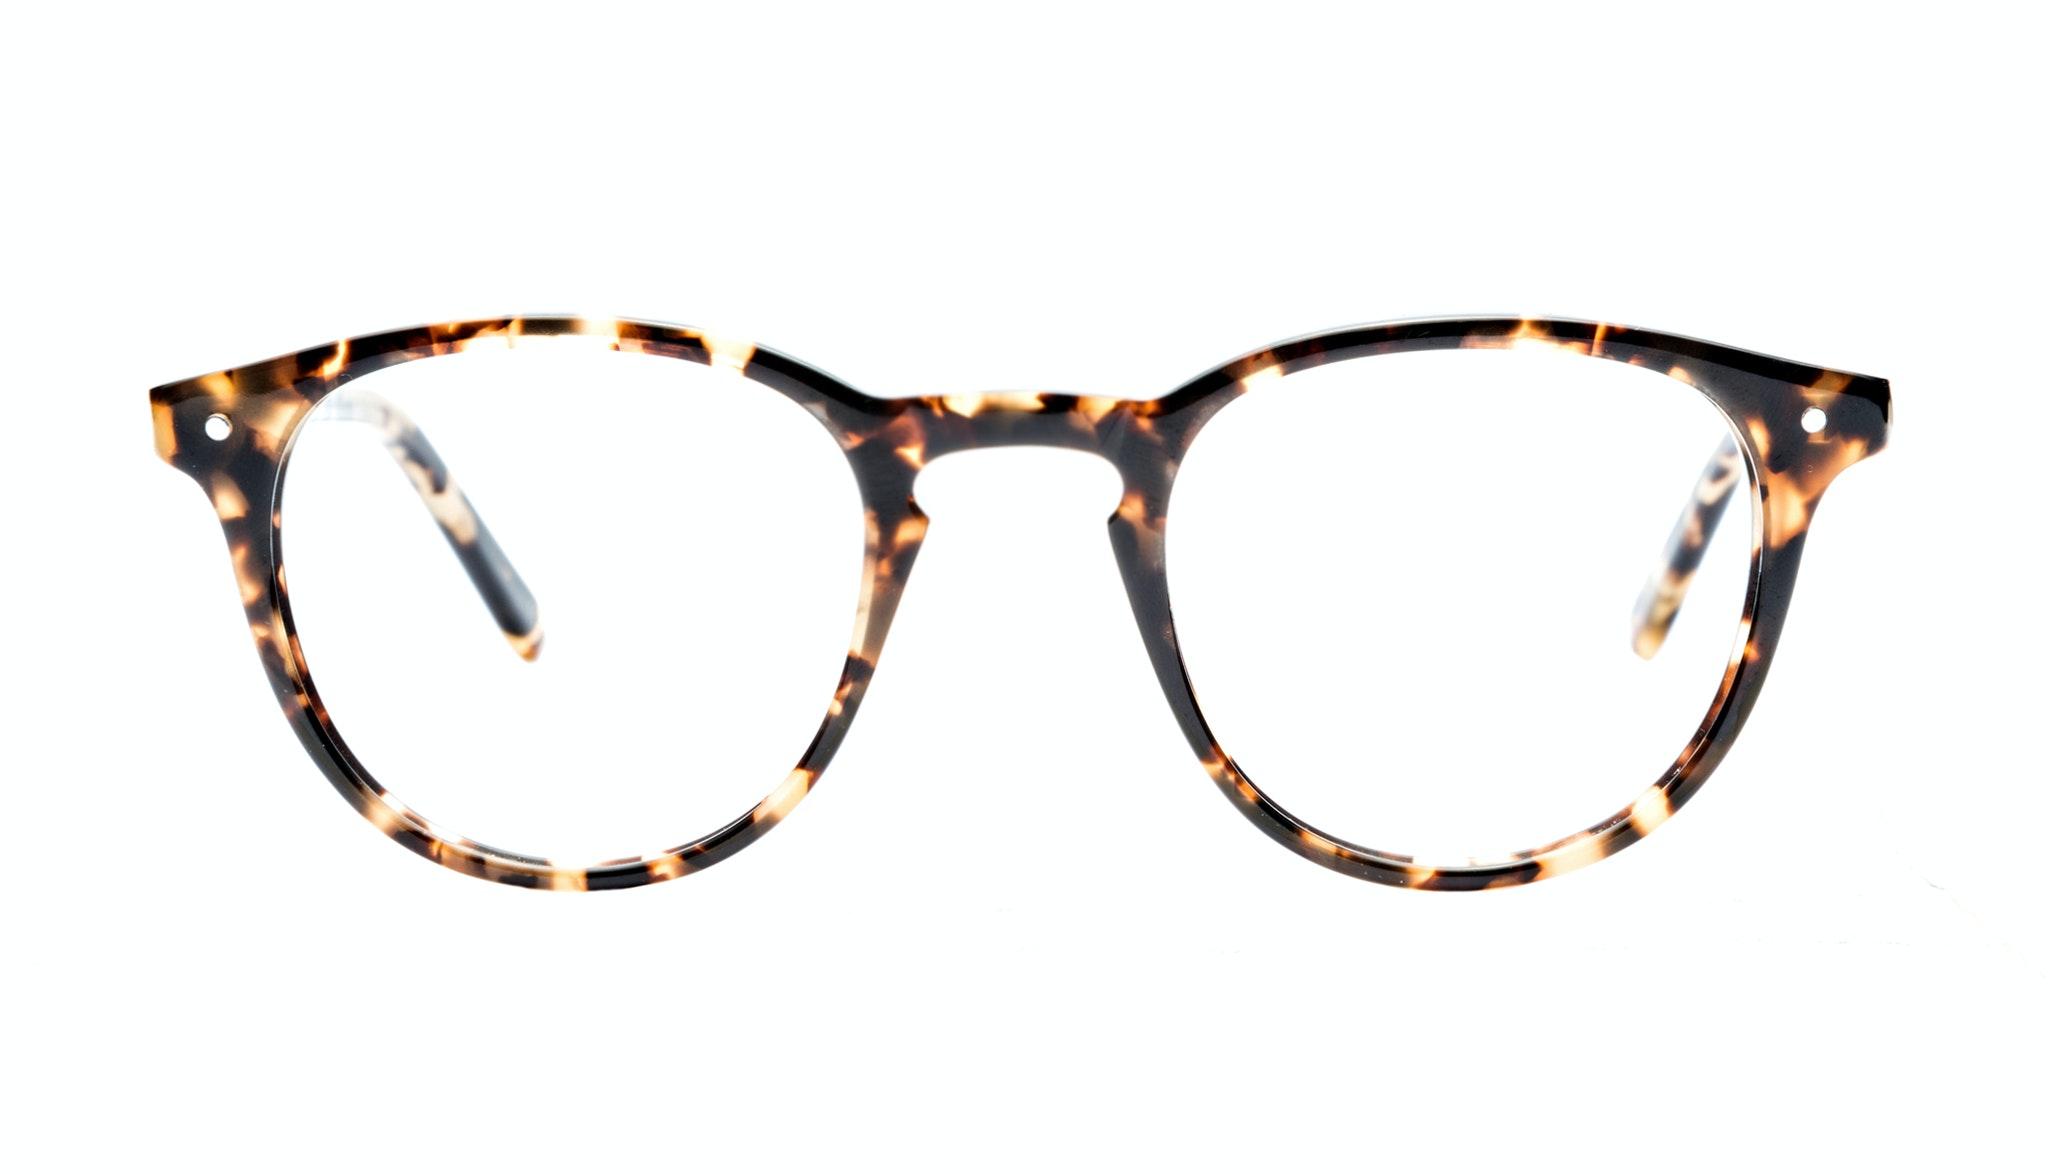 Affordable Fashion Glasses Round Eyeglasses Men Cult Dark Tortoise Front